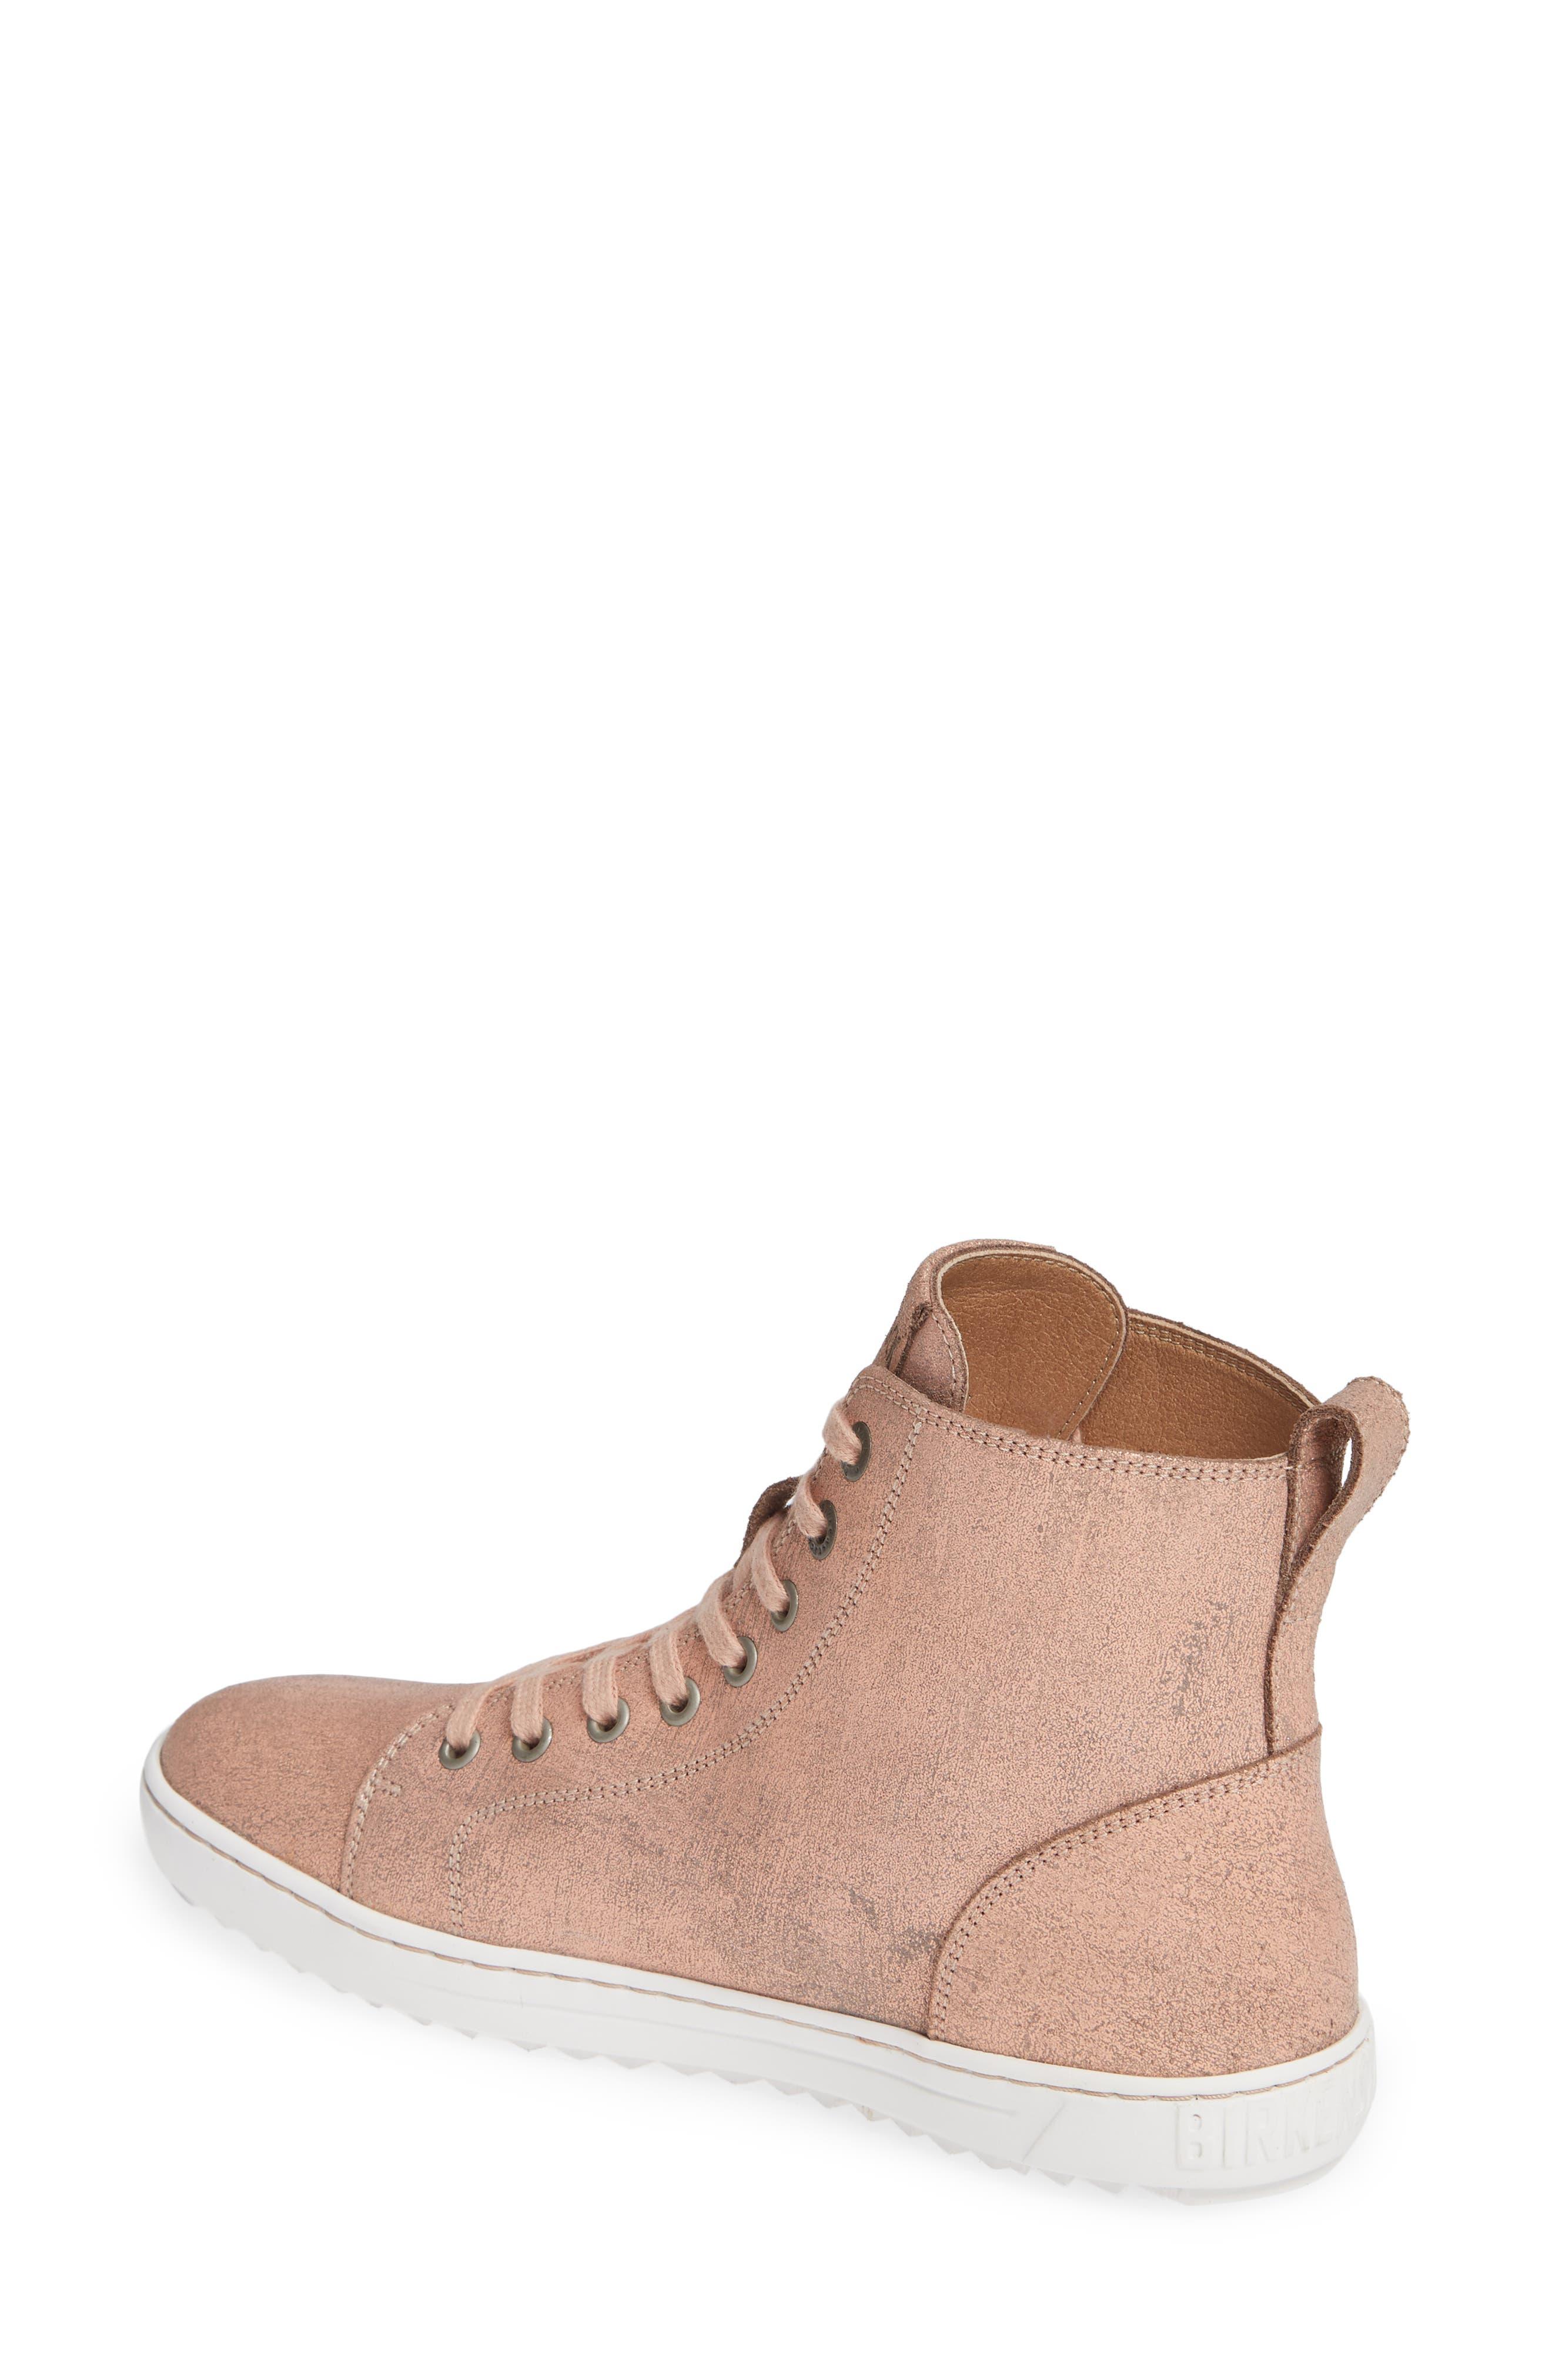 Bartlett High Top Sneaker,                             Alternate thumbnail 2, color,                             METALLIC ROSE LEATHER